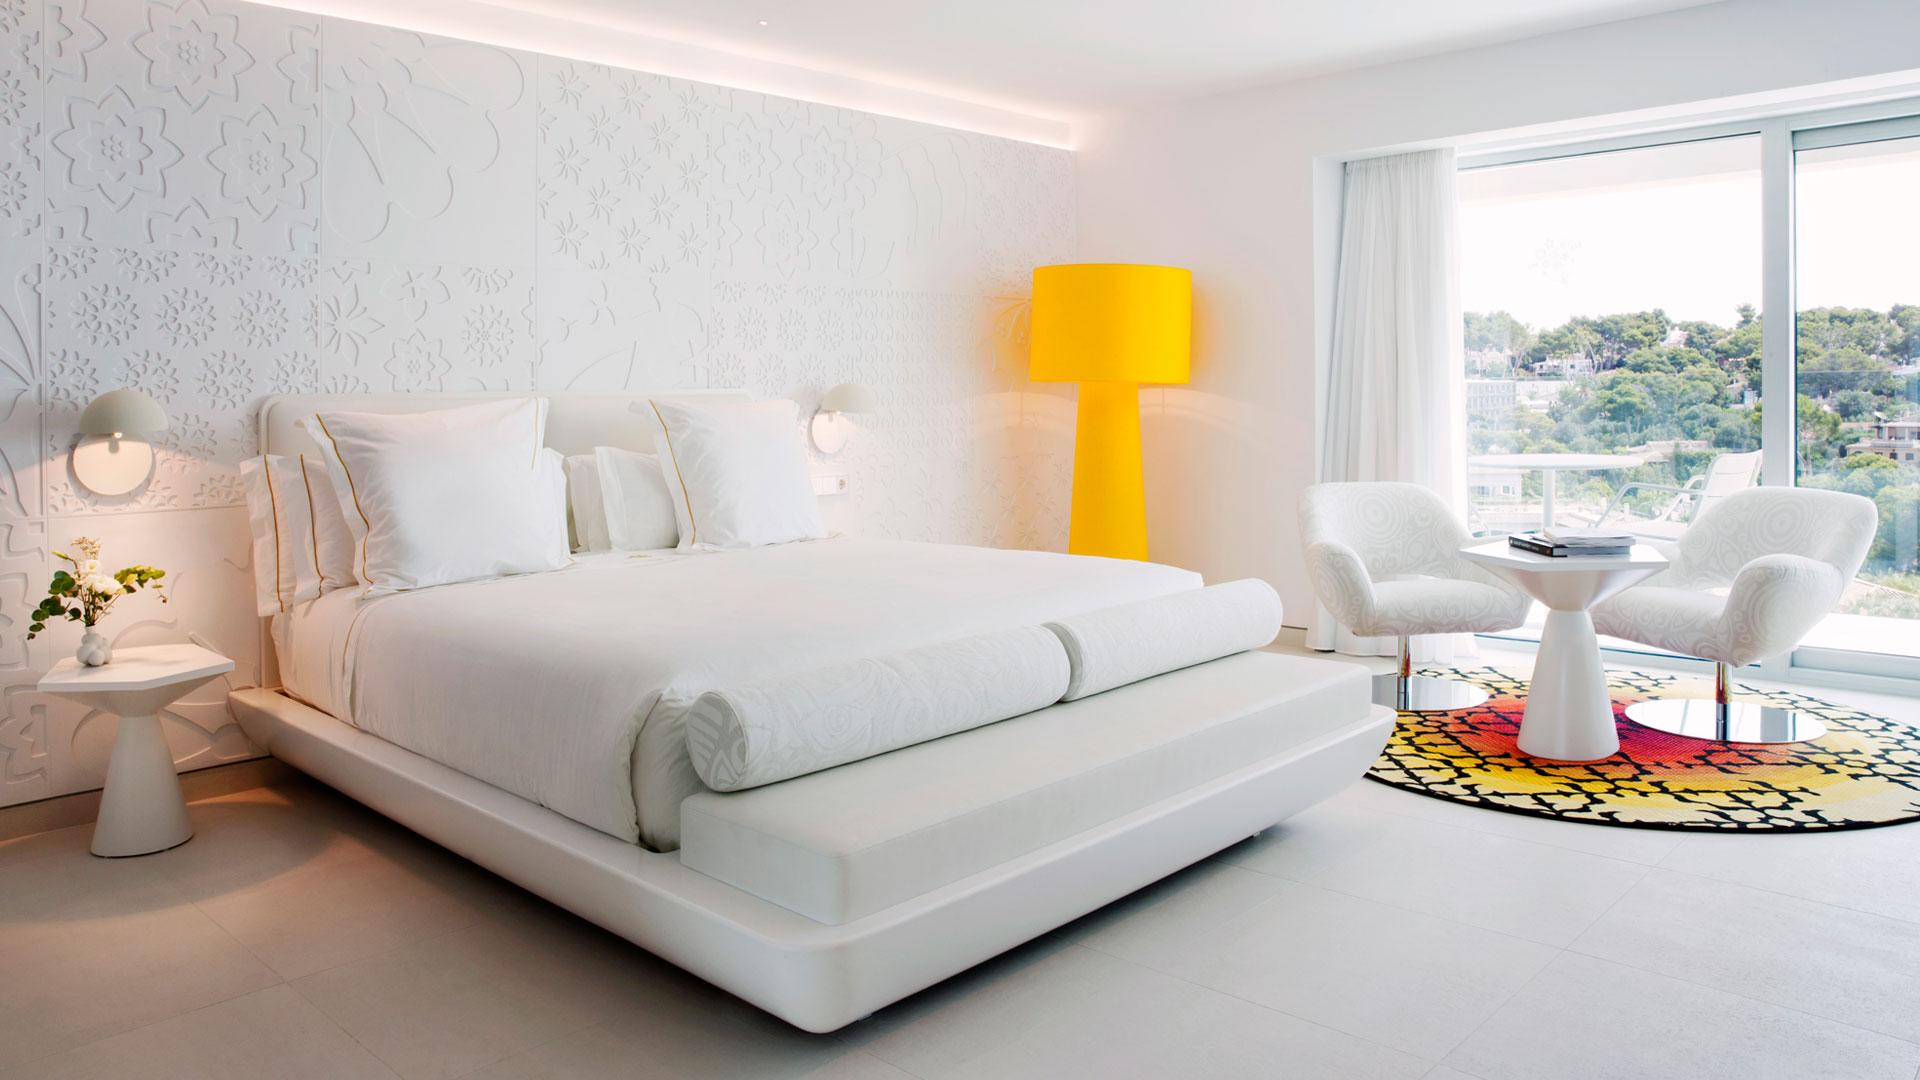 PLACAS RELIEVE EN HOTEL IBEROSTAR MALLORCA